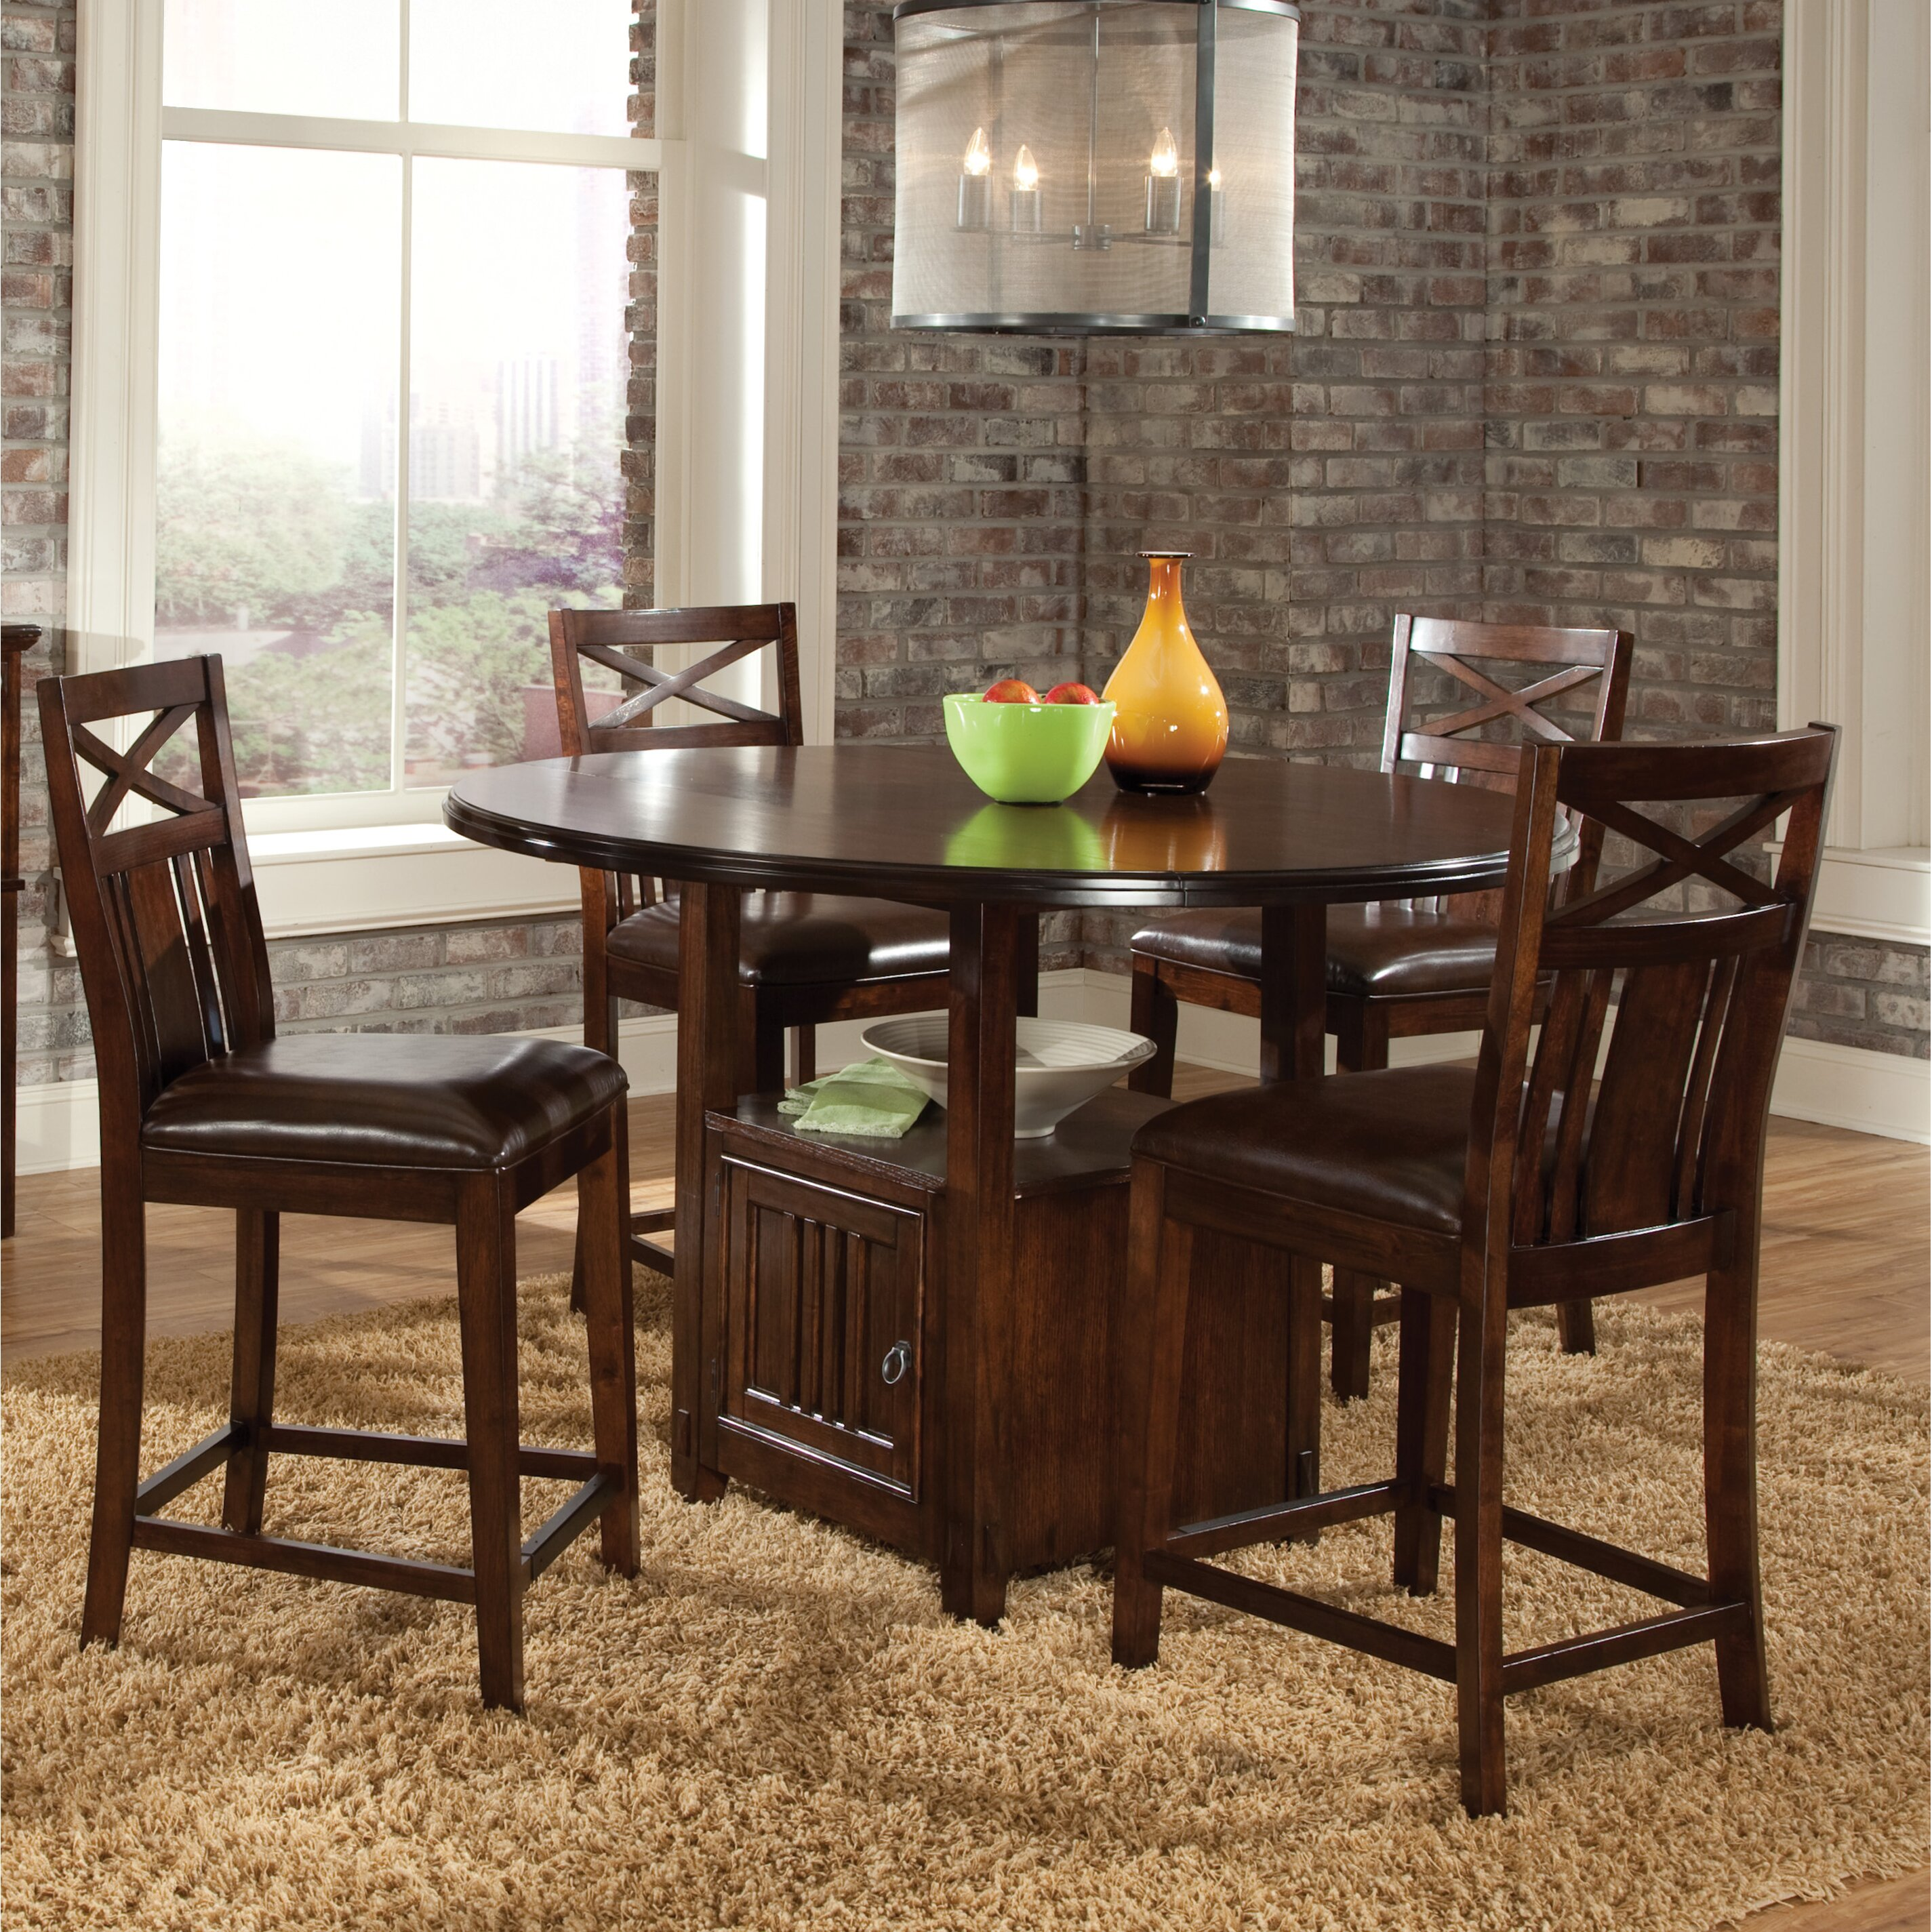 Standard Furniture Dining Room Sets: Standard Furniture Sonoma 5 Piece Dining Set & Reviews